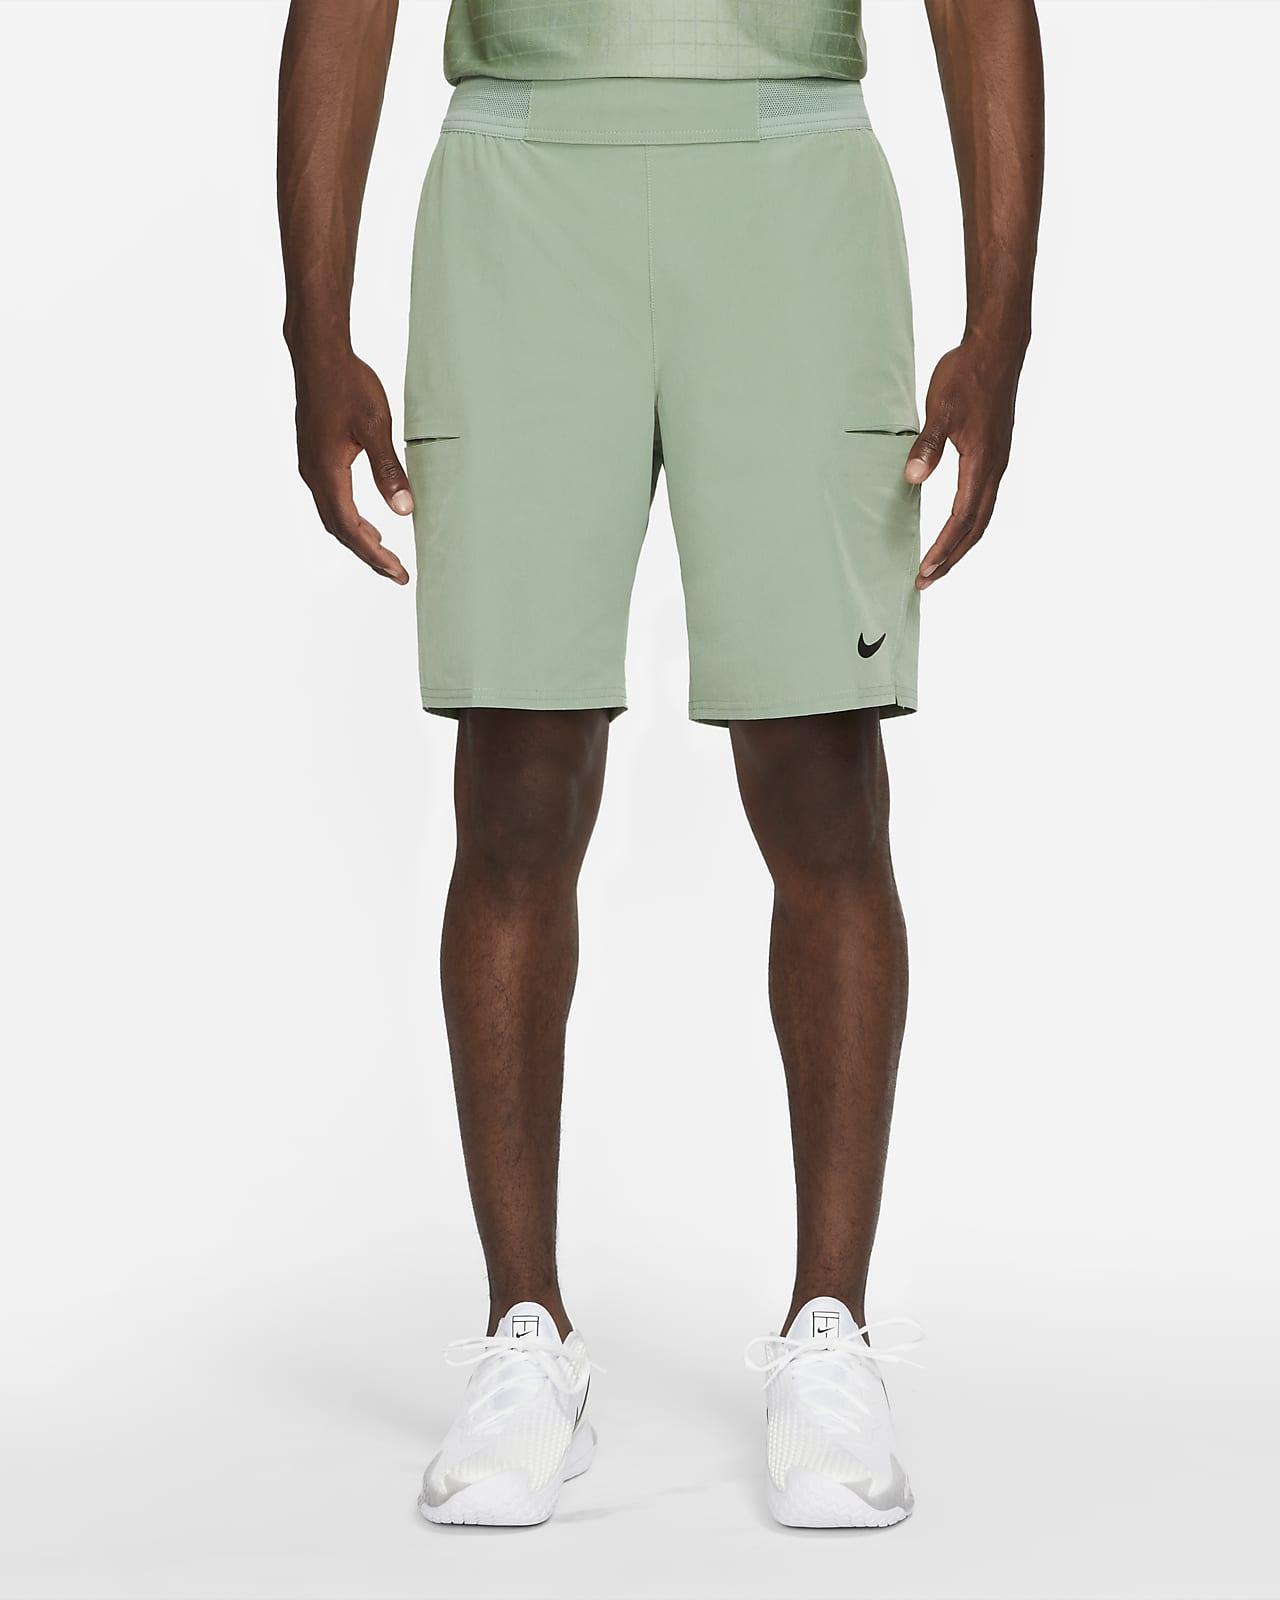 Tennisshorts NikeCourt Dri-FIT Advantage 23 cm för män